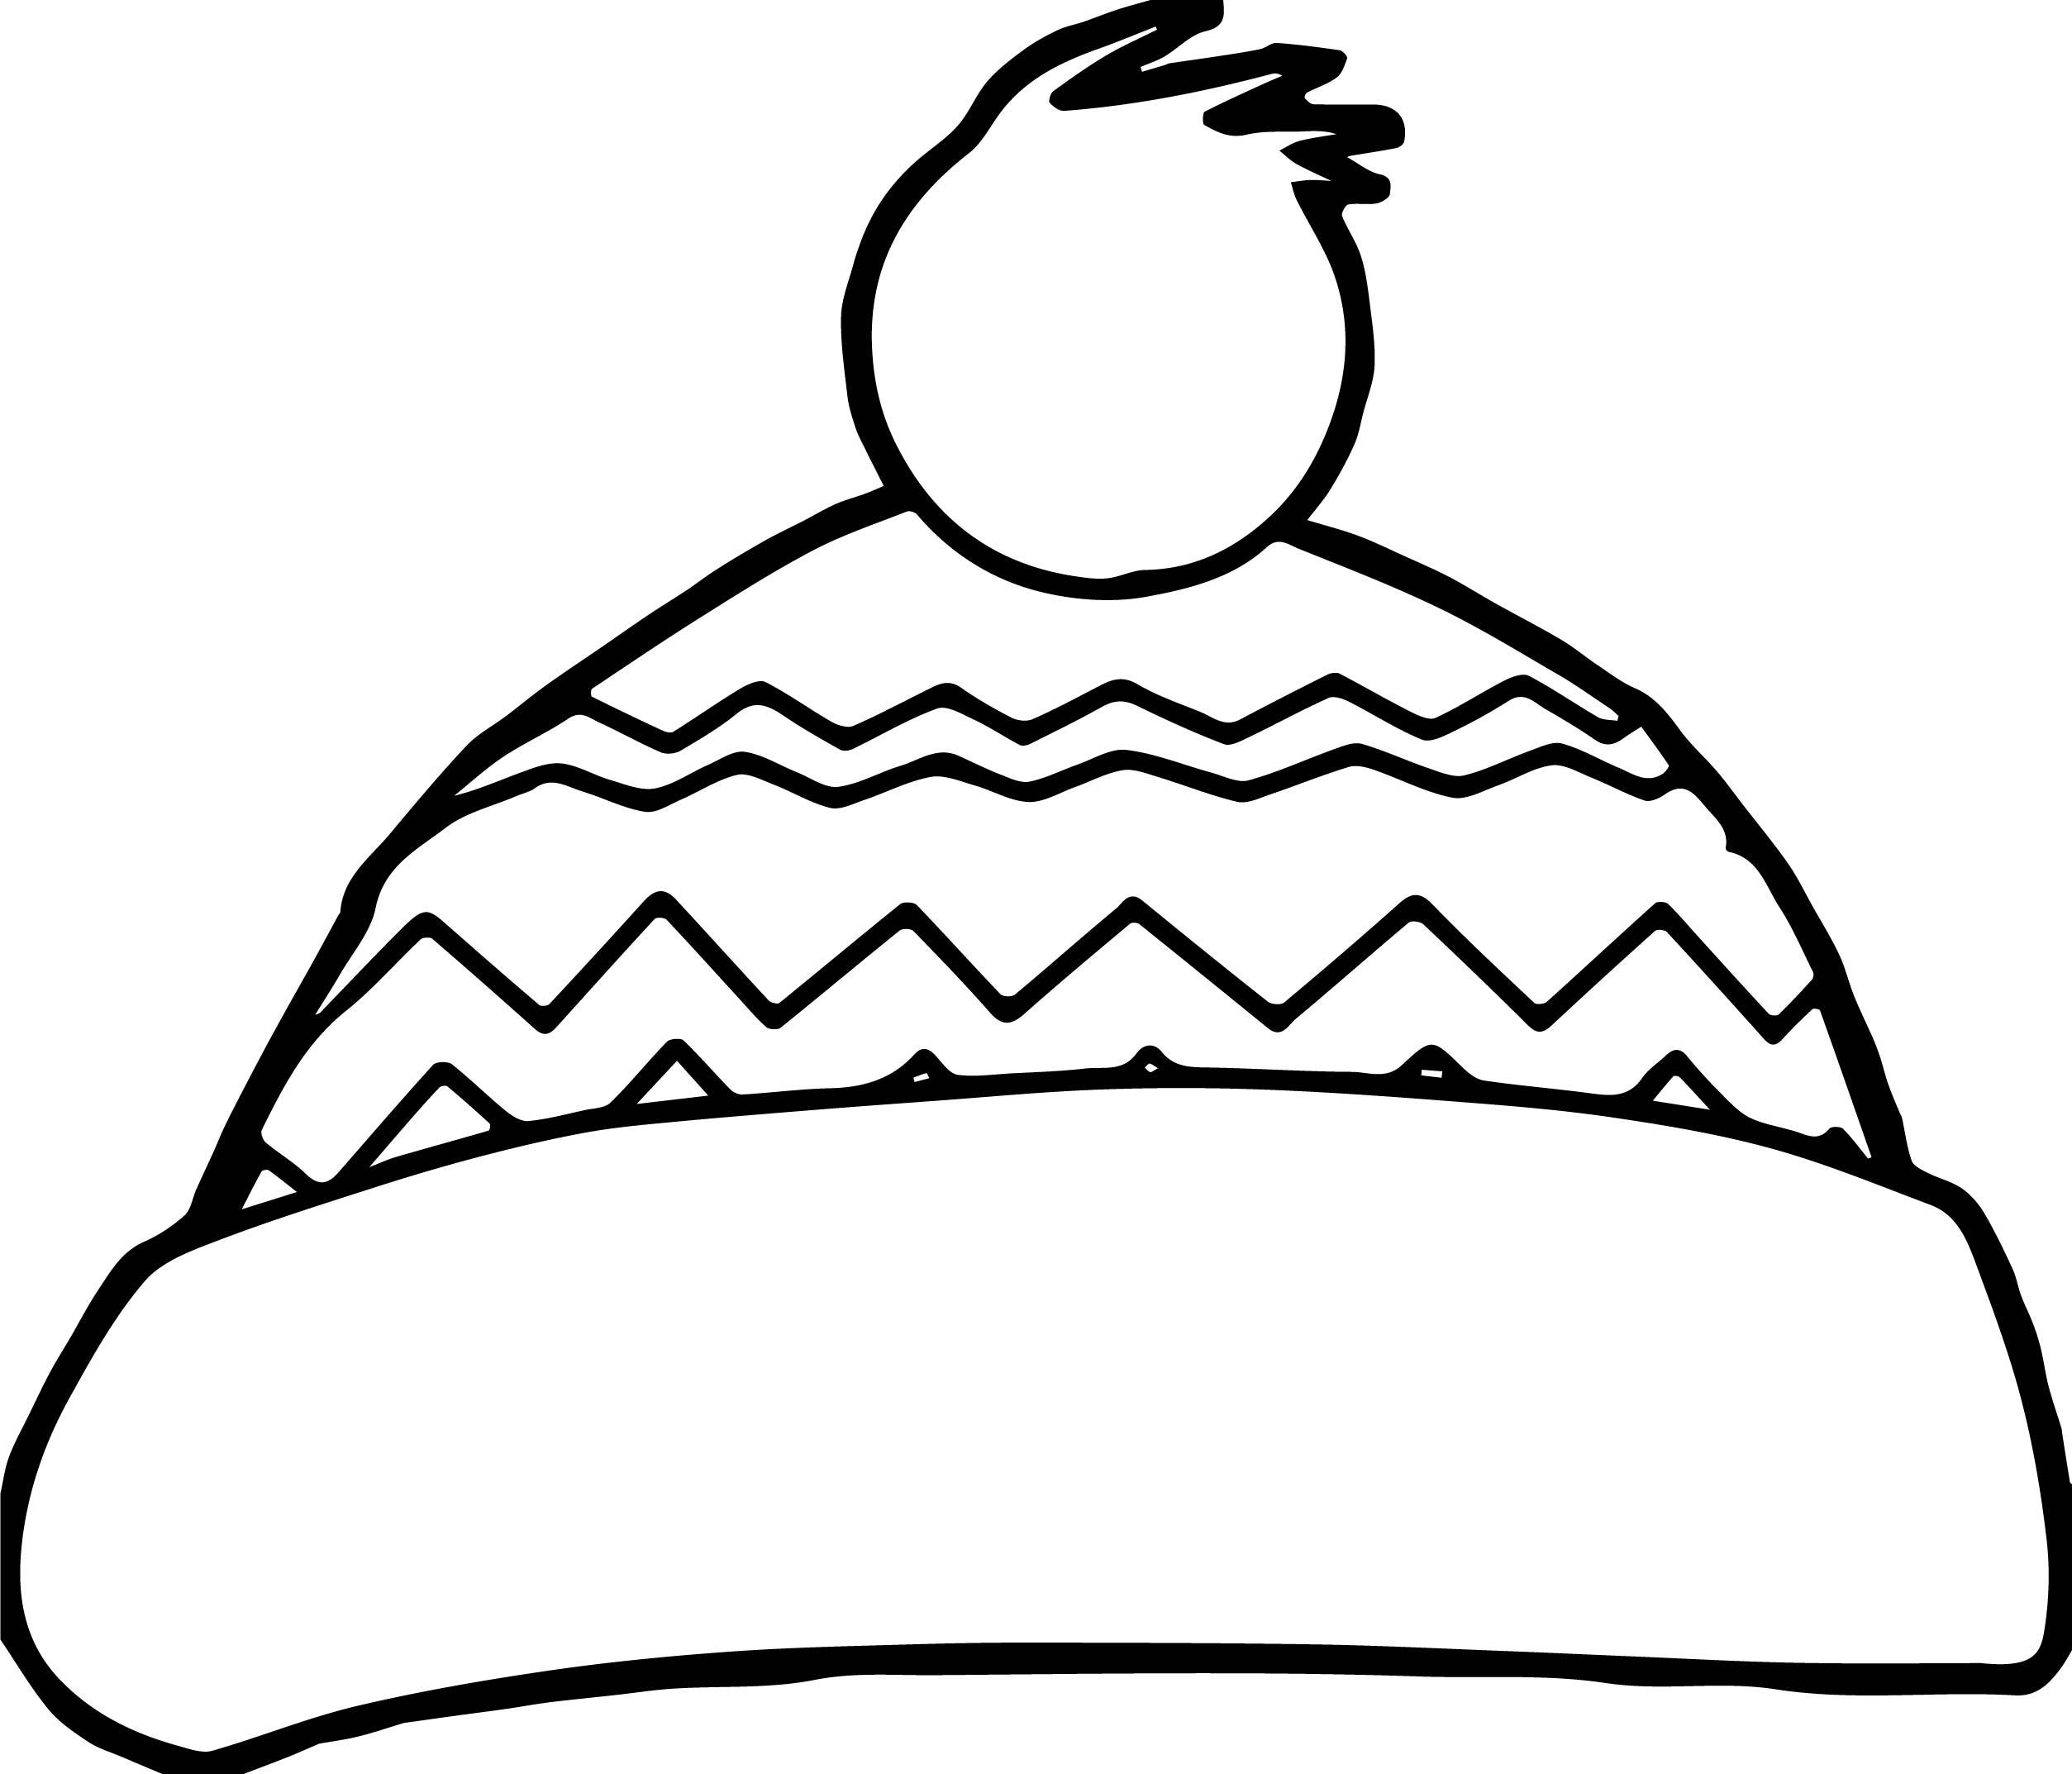 2507x2146 Enjoyable Design Ideas Hat Coloring Page Winter Snow